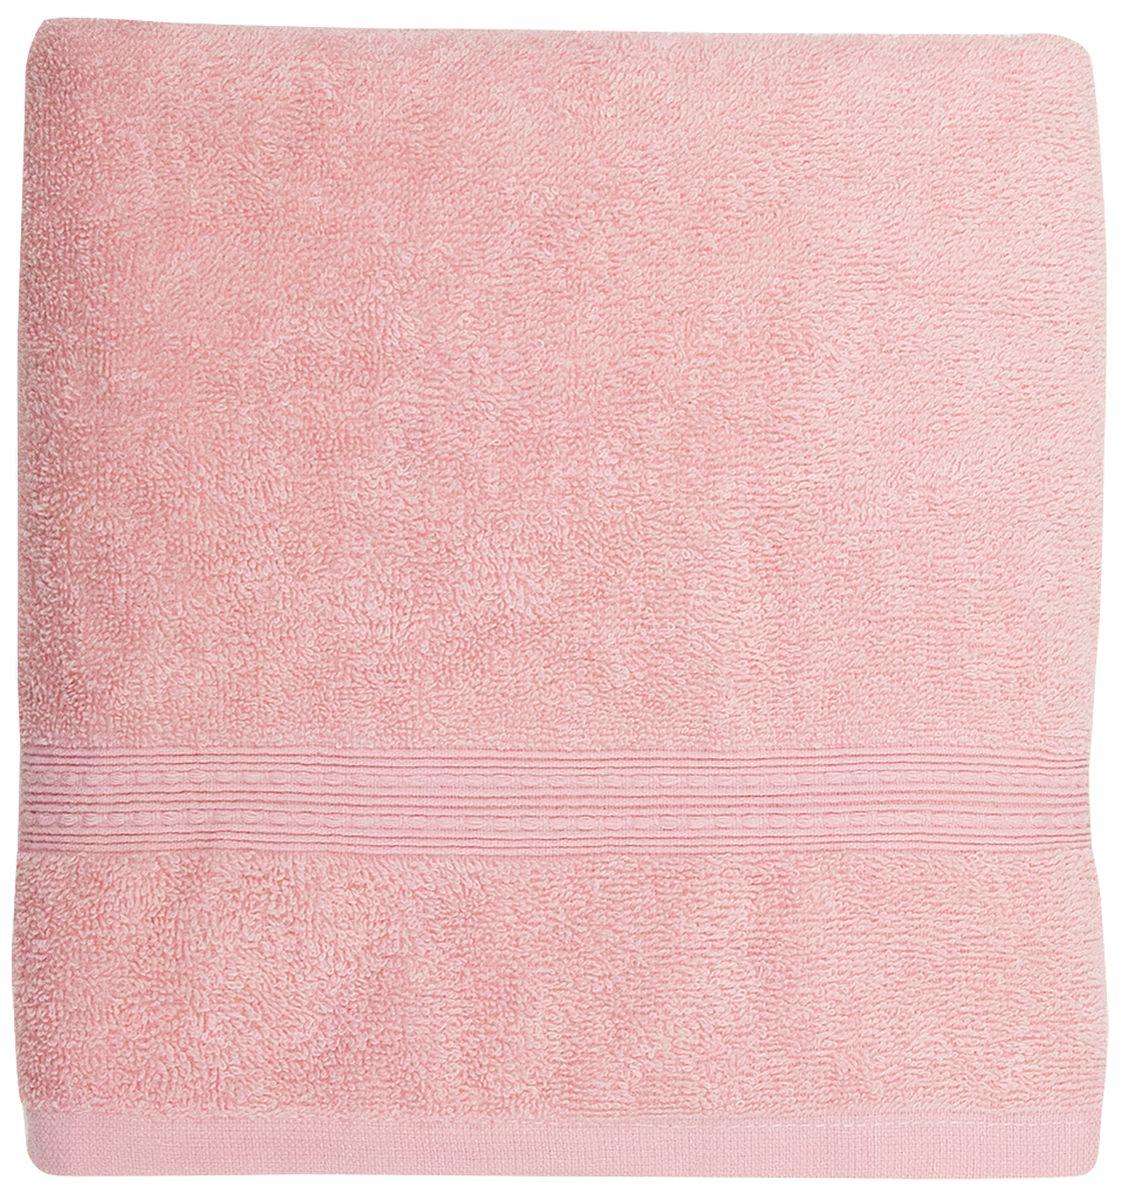 Полотенце банное Bonita Classic, махровое, цвет: роза, 50 x 90 см1011217218Полотенце банное 50*90 Bonita Classic, махровое